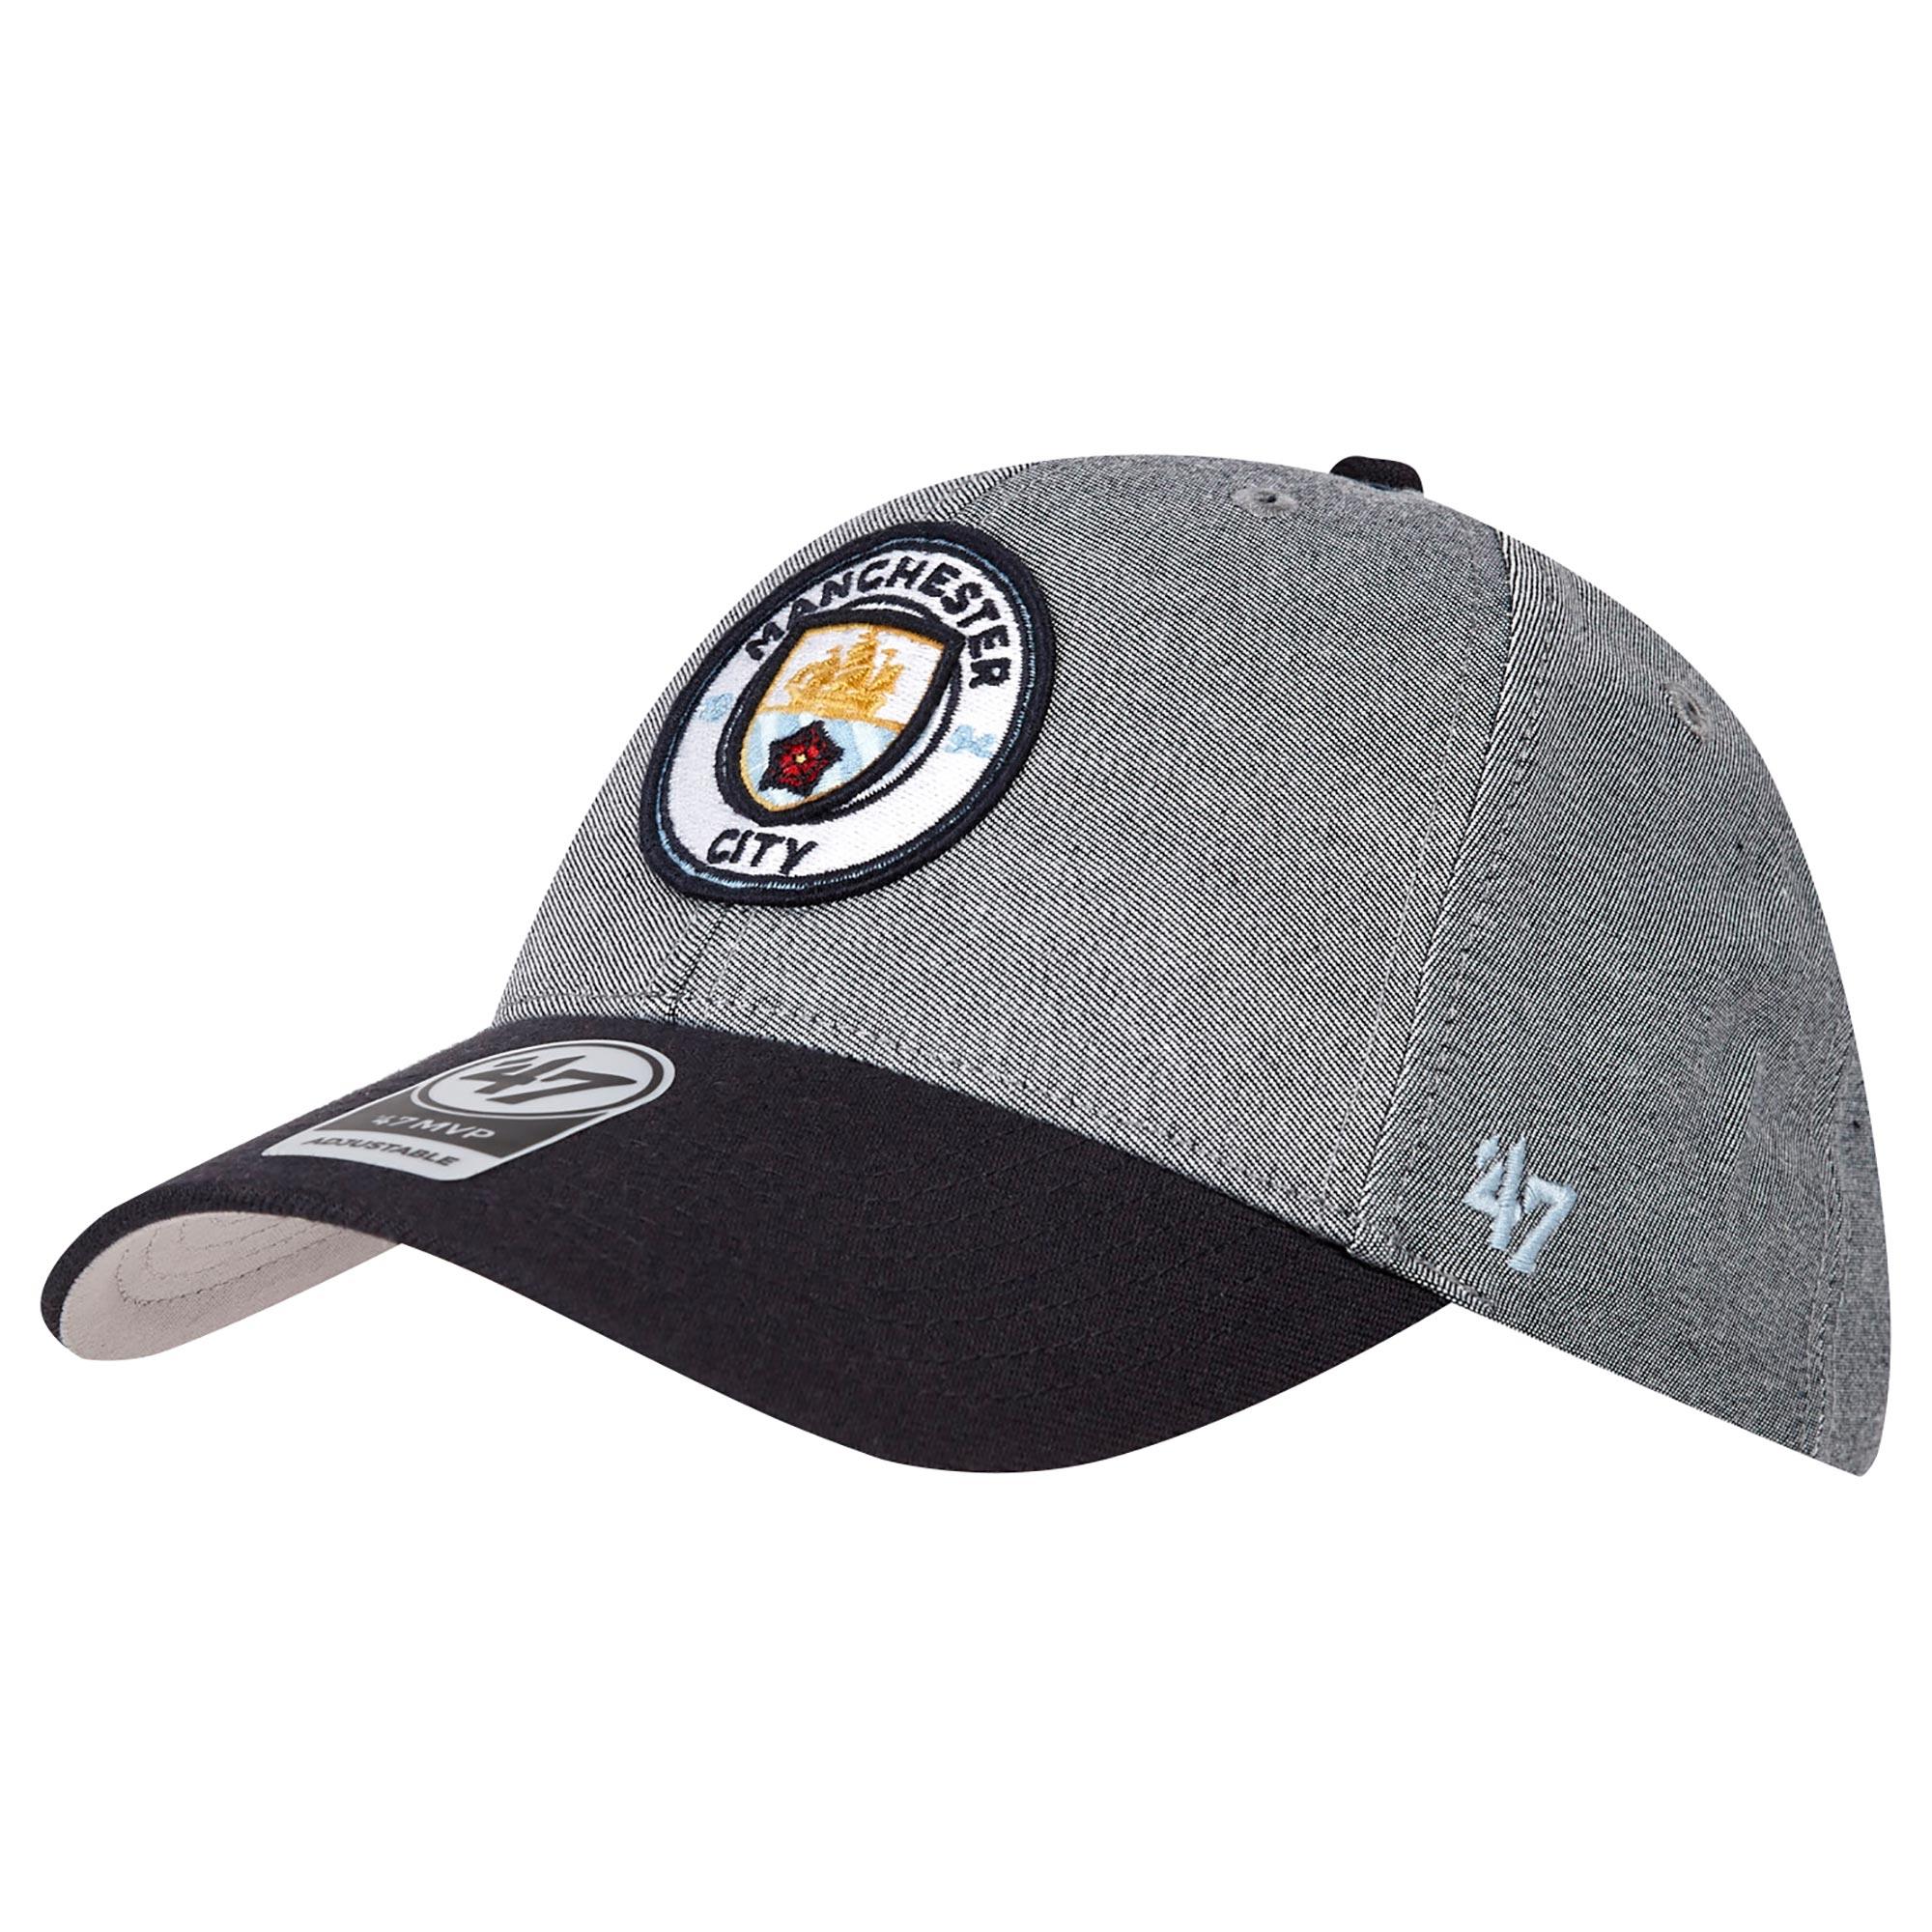 Manchester City 47 Outfitter Cap - Navy